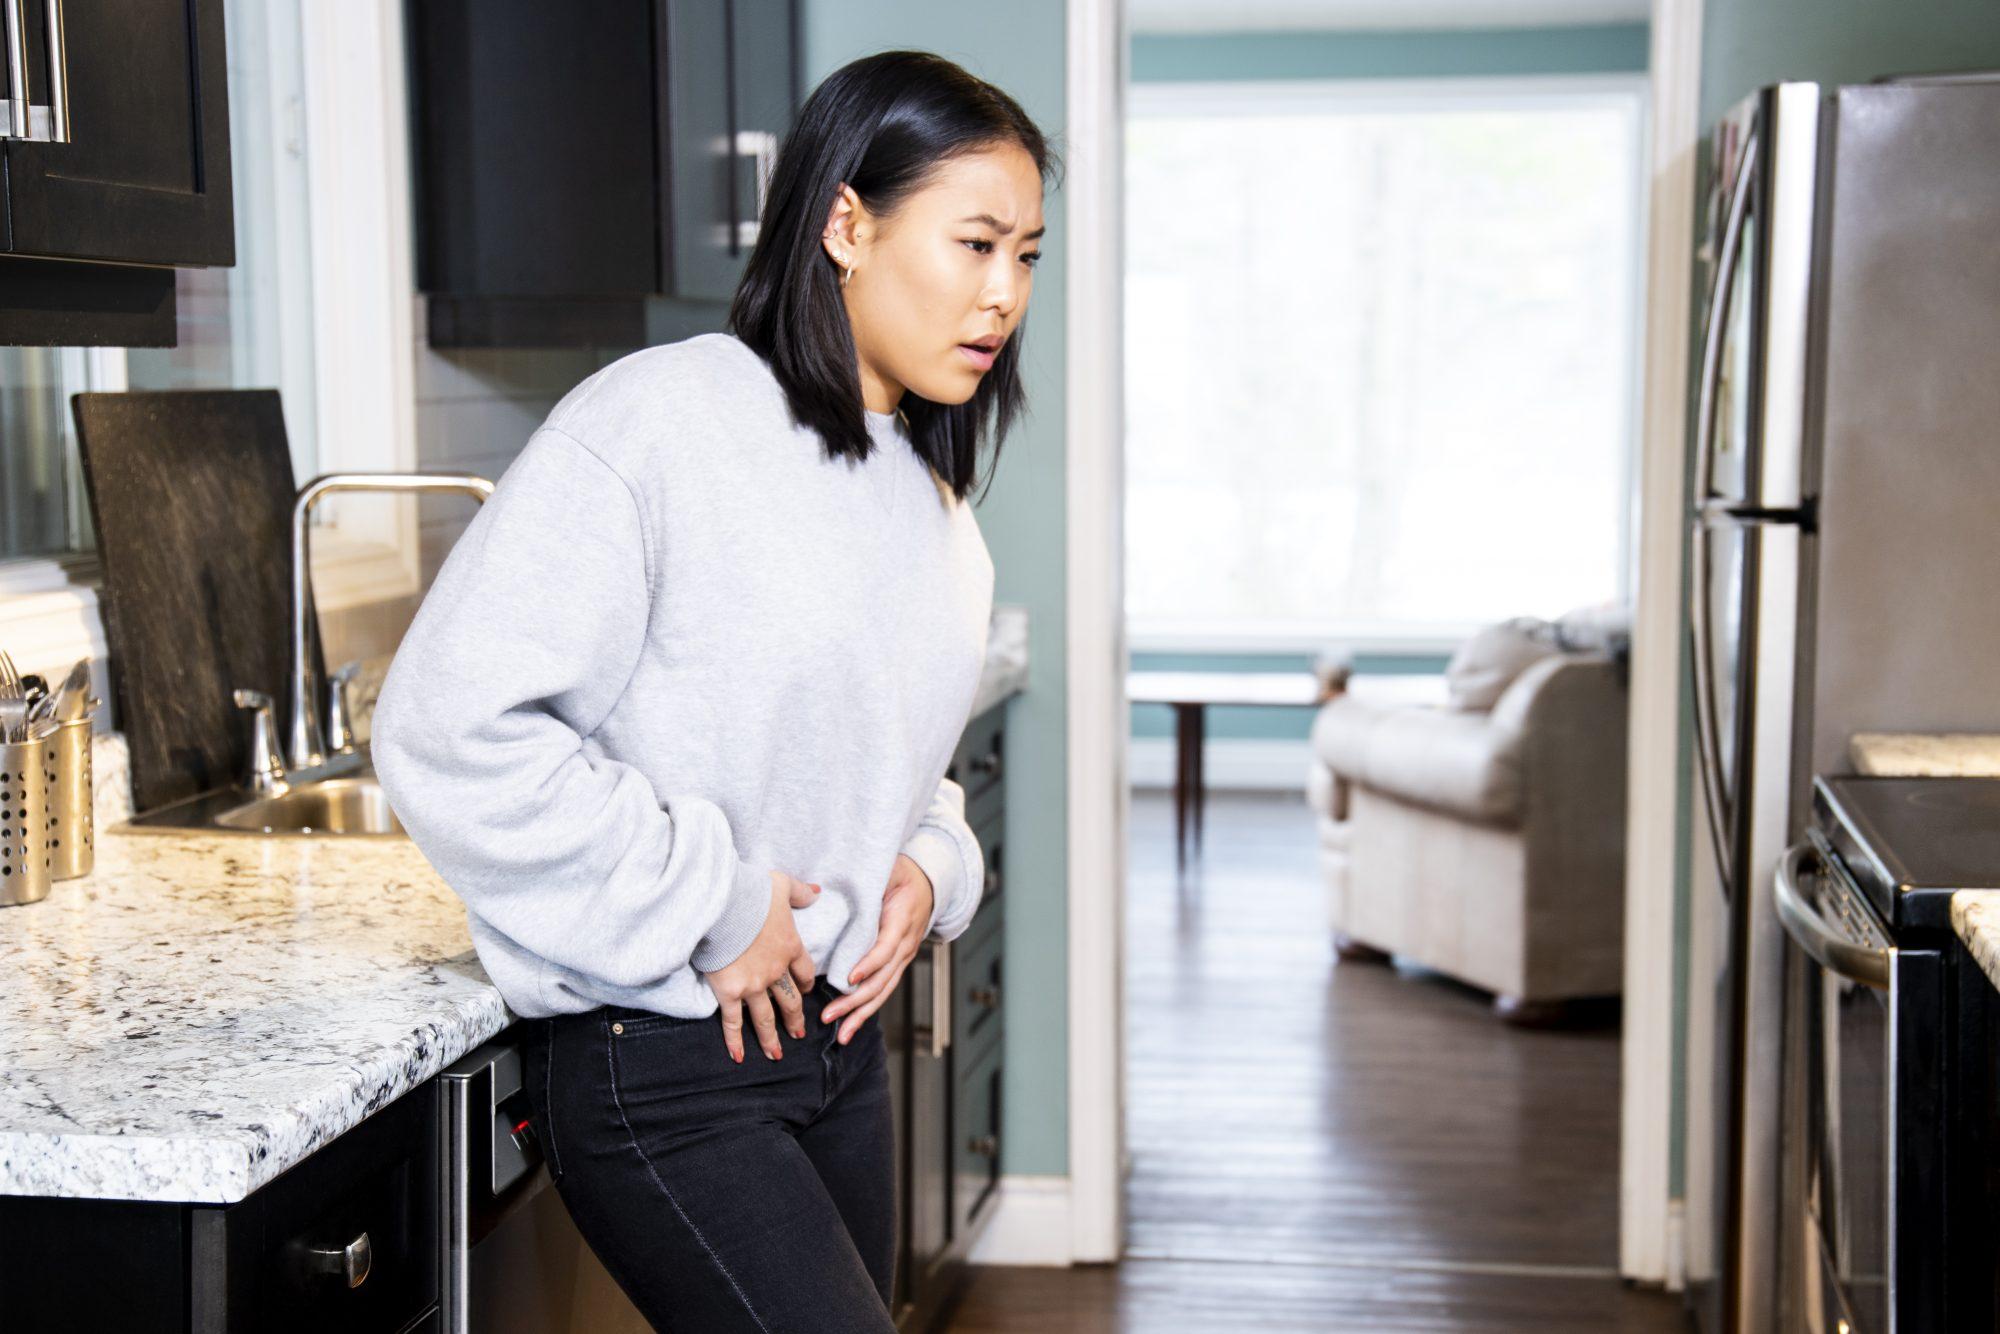 pelvic floor, pelvic floor exercises